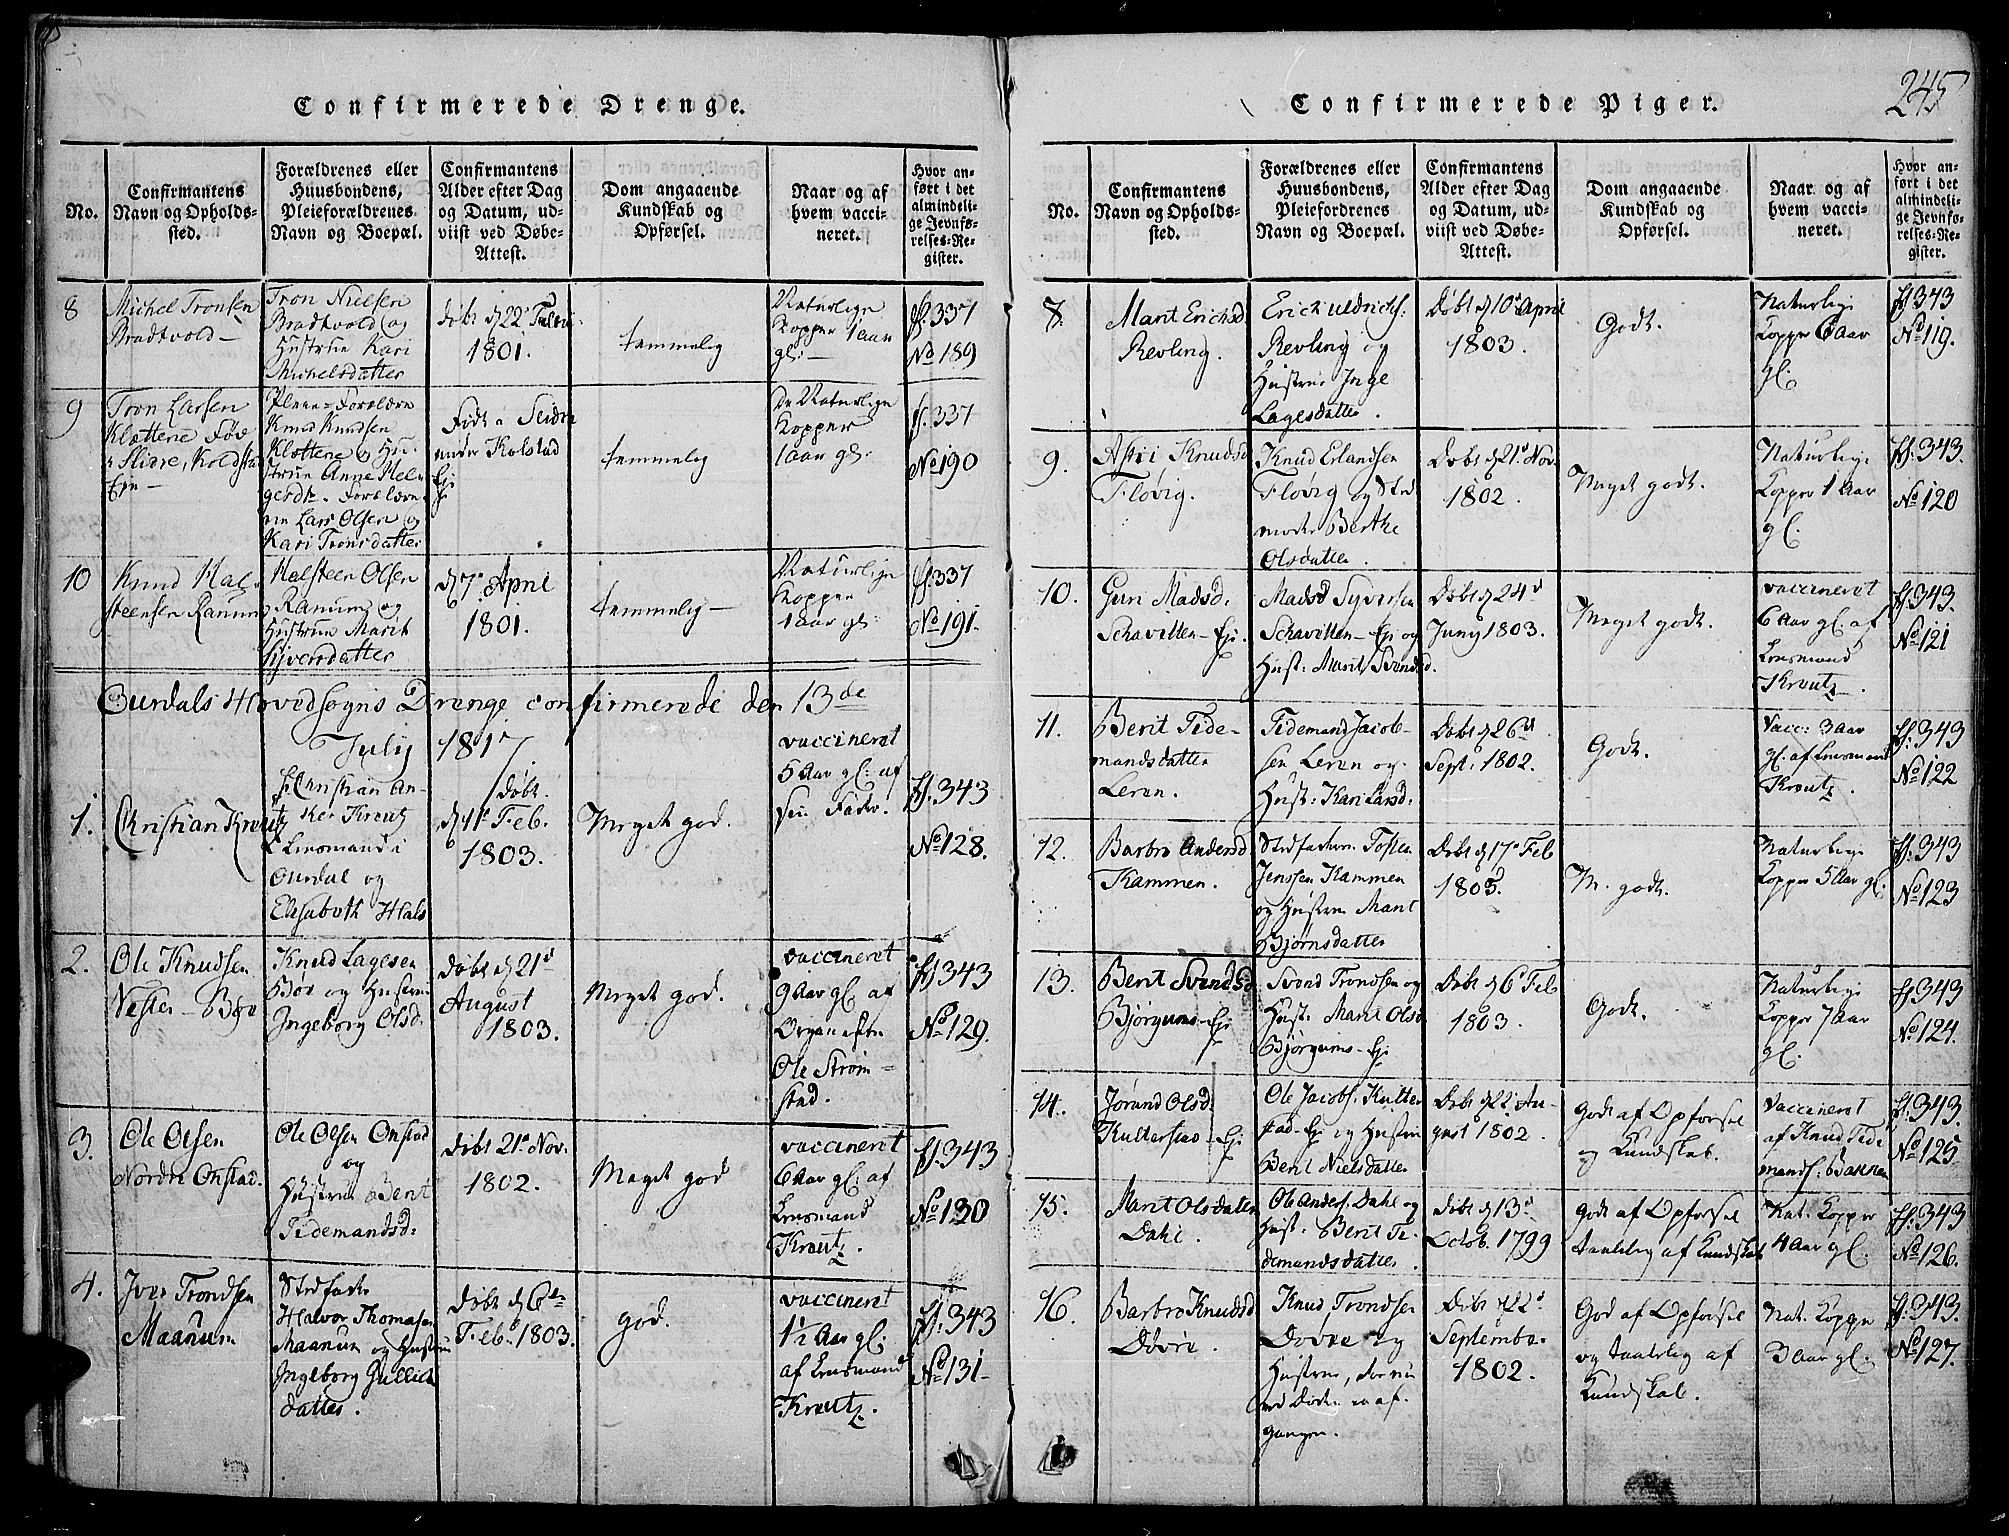 SAH, Nord-Aurdal prestekontor, Ministerialbok nr. 2, 1816-1828, s. 245